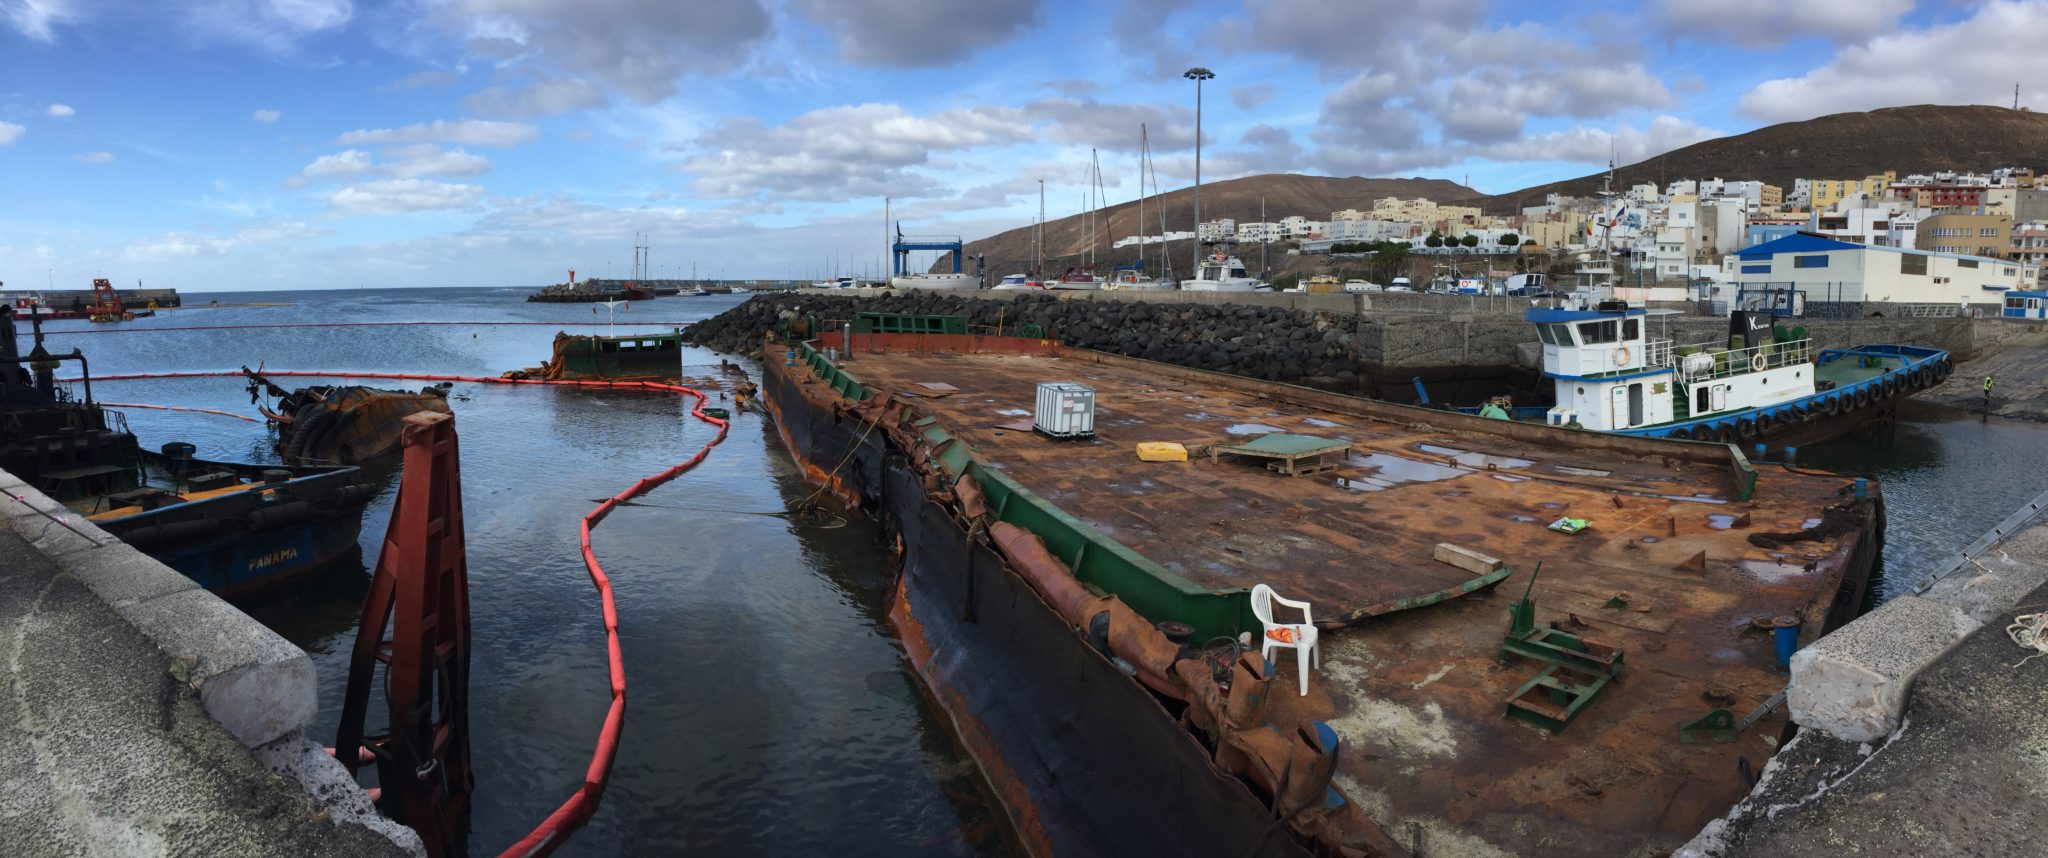 Canaria-island-disaster-port-torres-foamflex200-sponge-oilspill